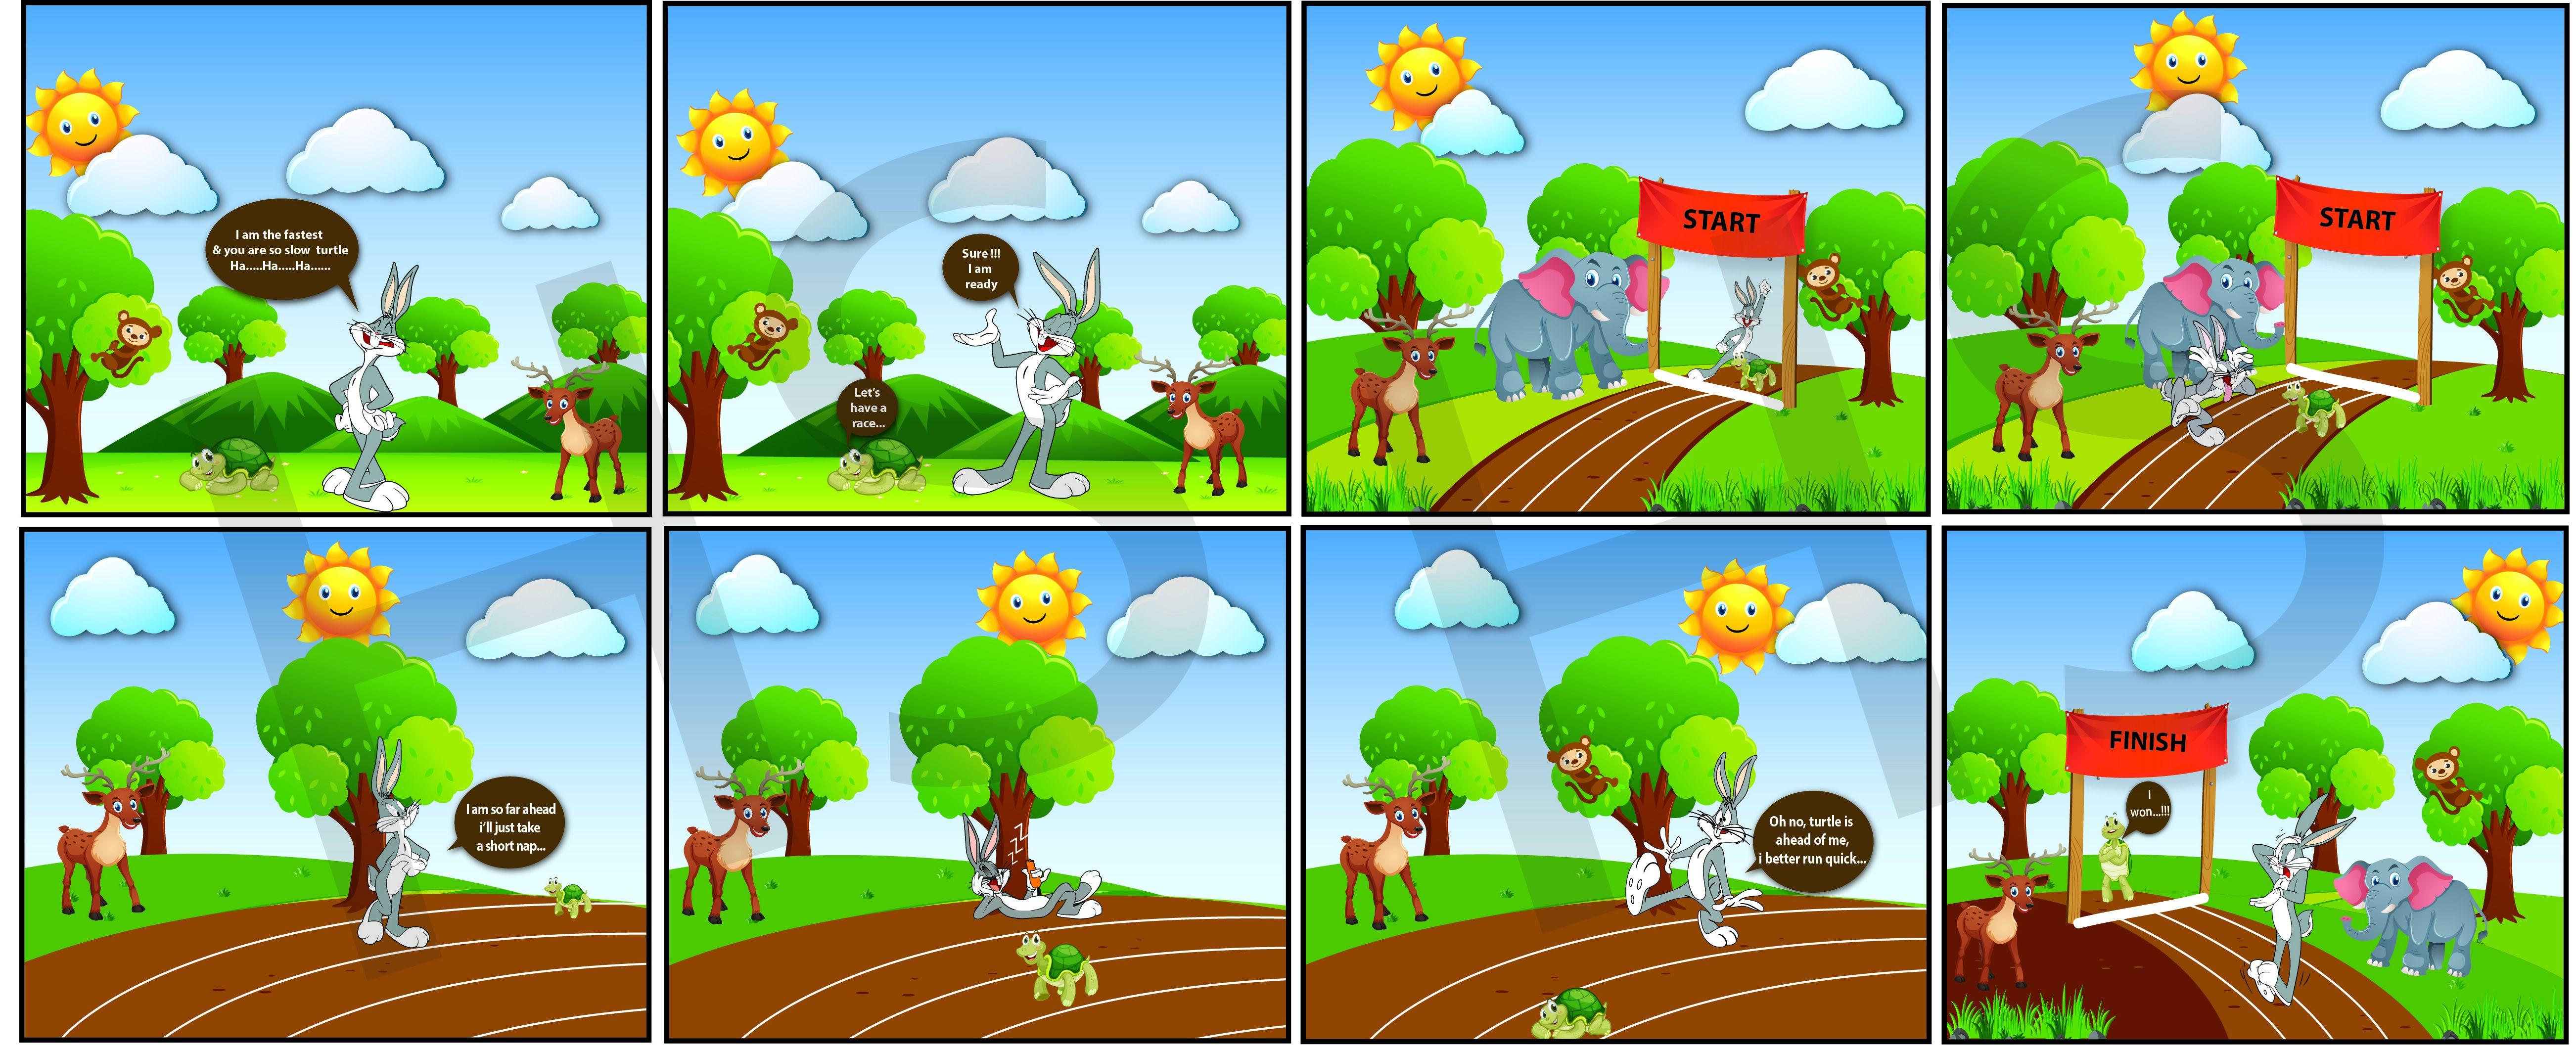 Storybook Illustration 1